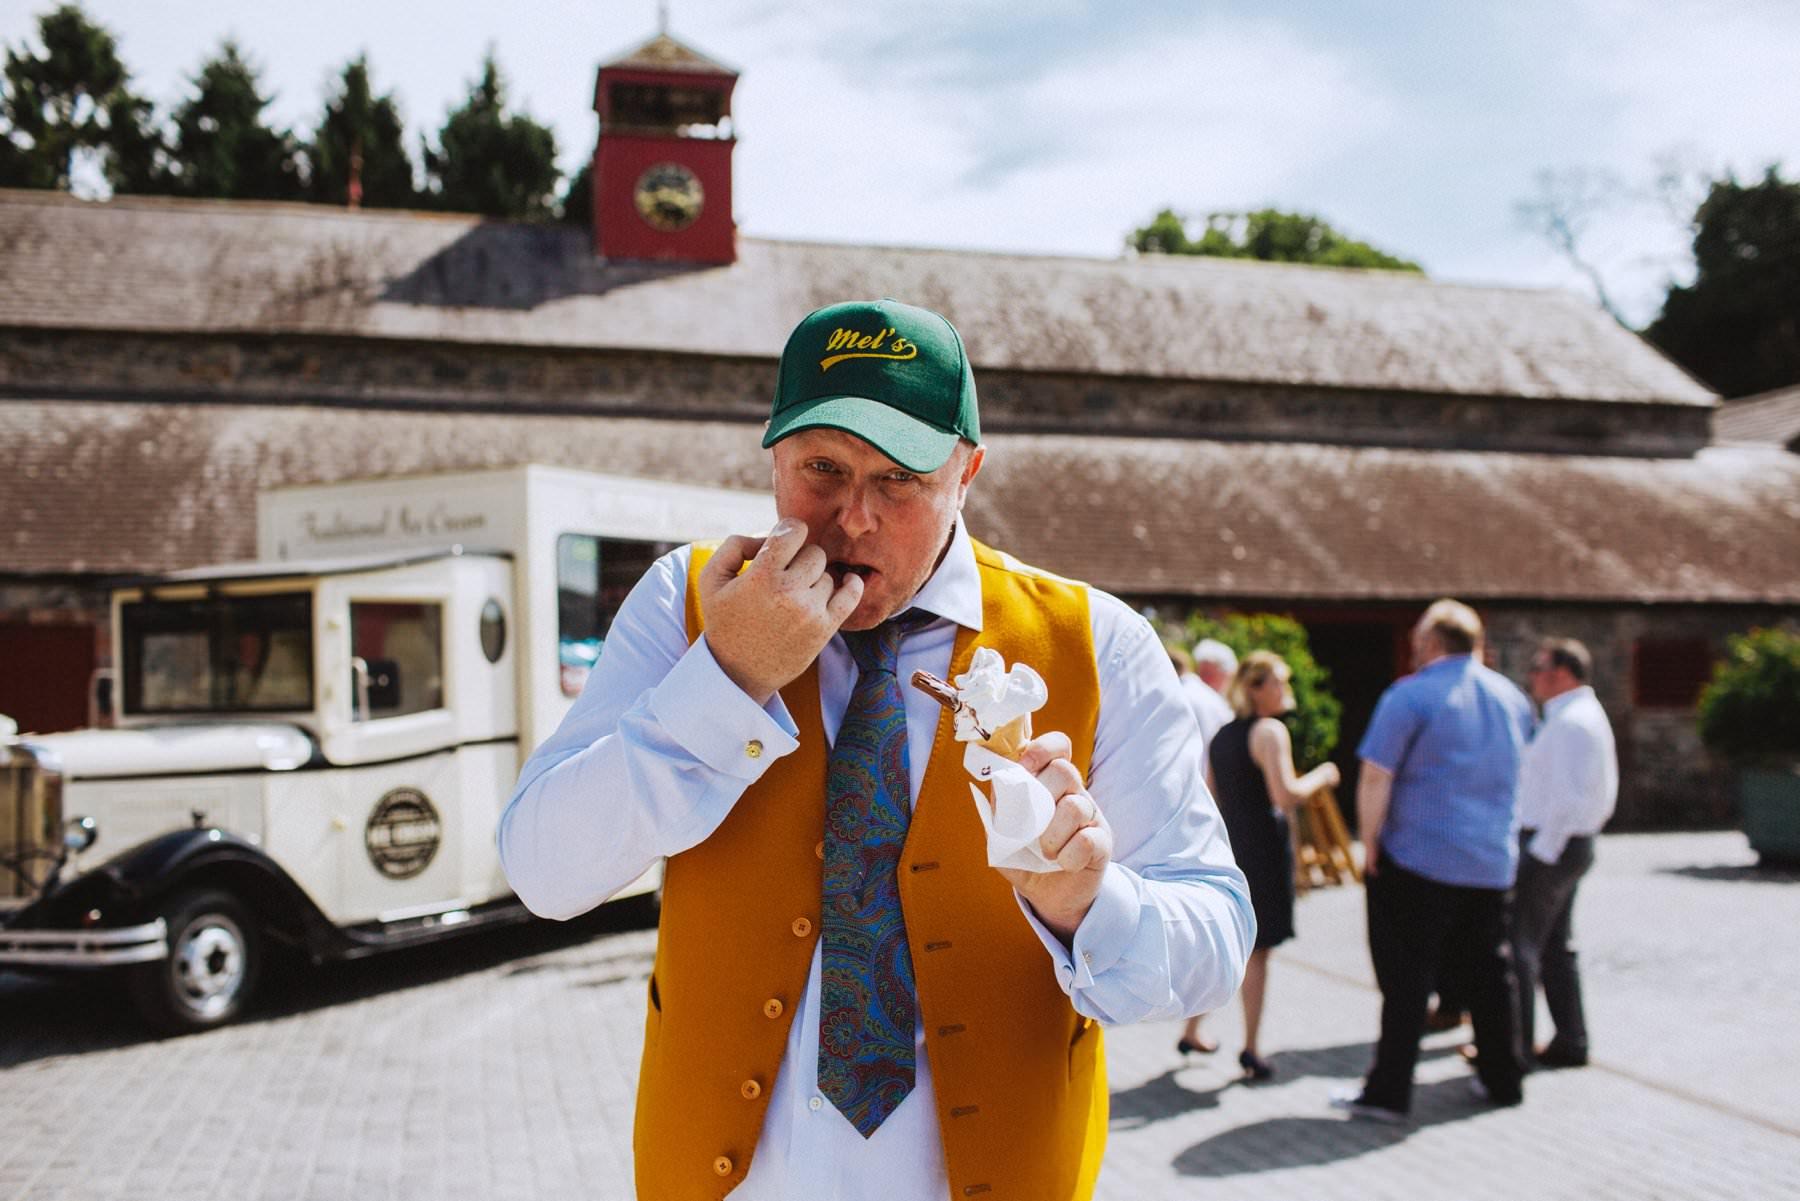 groom in green baseball cap celebrates with soft serve ice cream